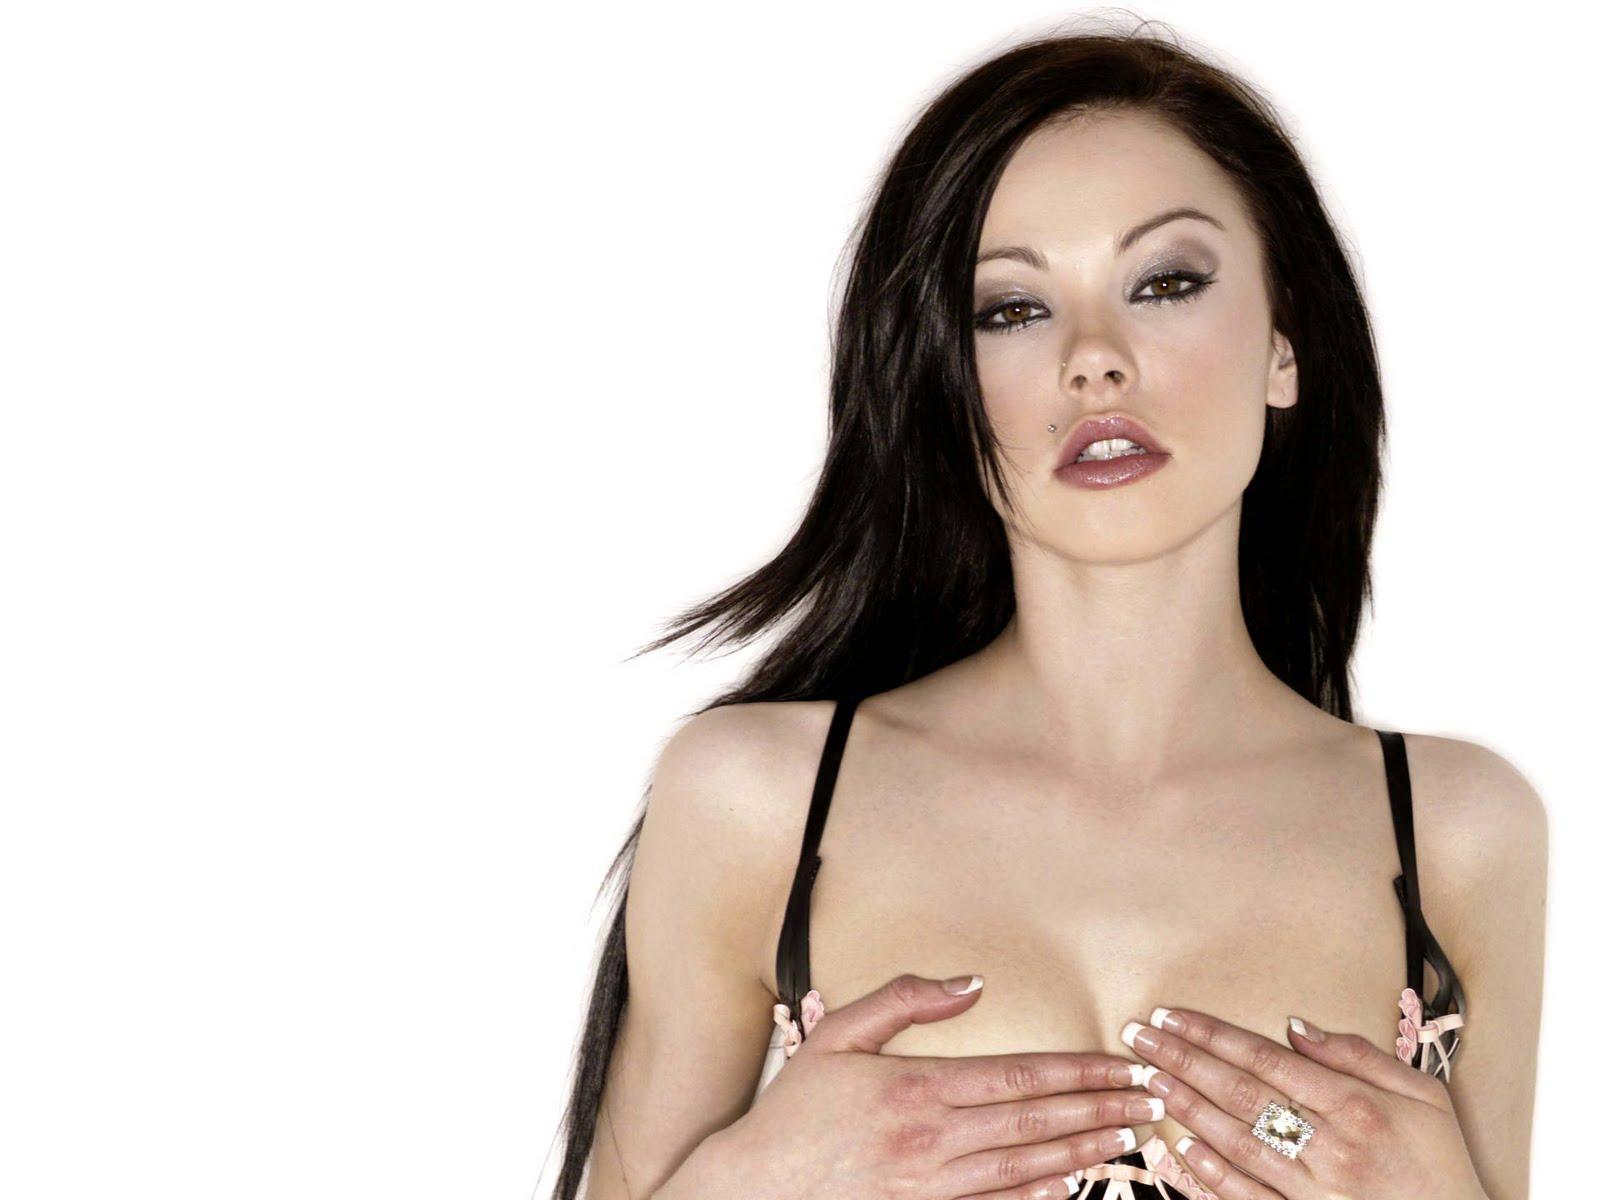 Alyx vance porn cosplay